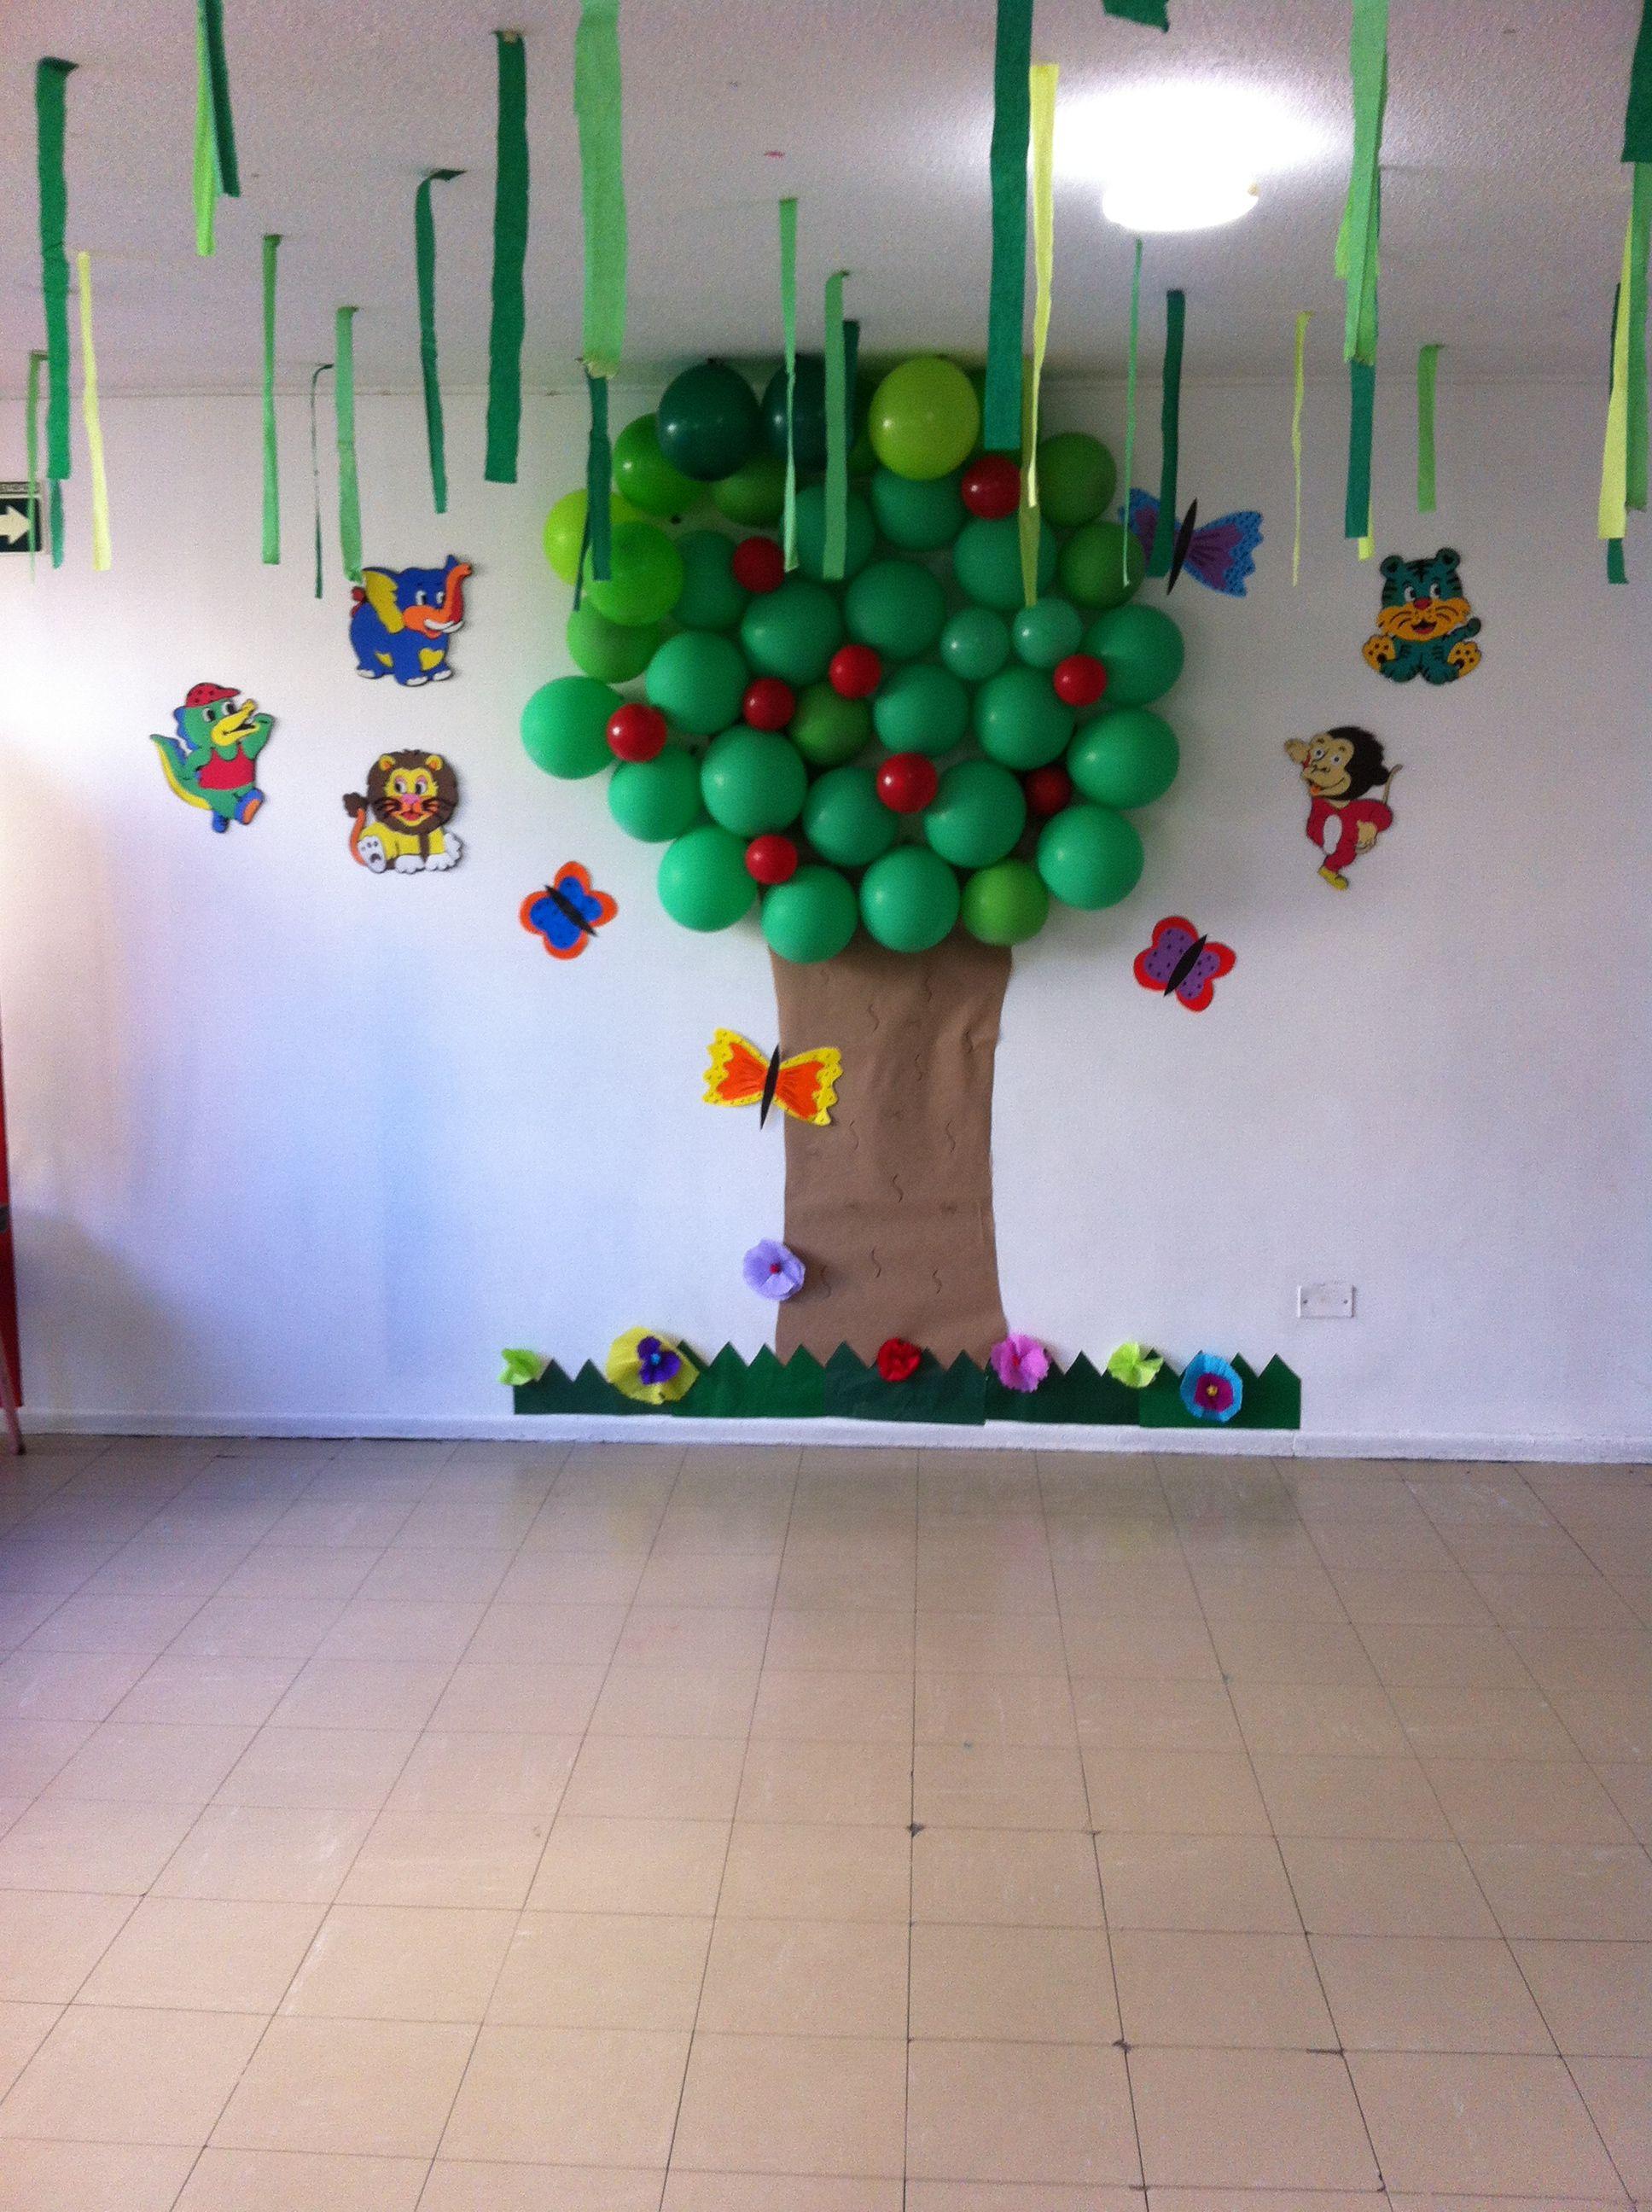 Decoraci n de aula infantil ideas para el aula for Decoracion primavera manualidades